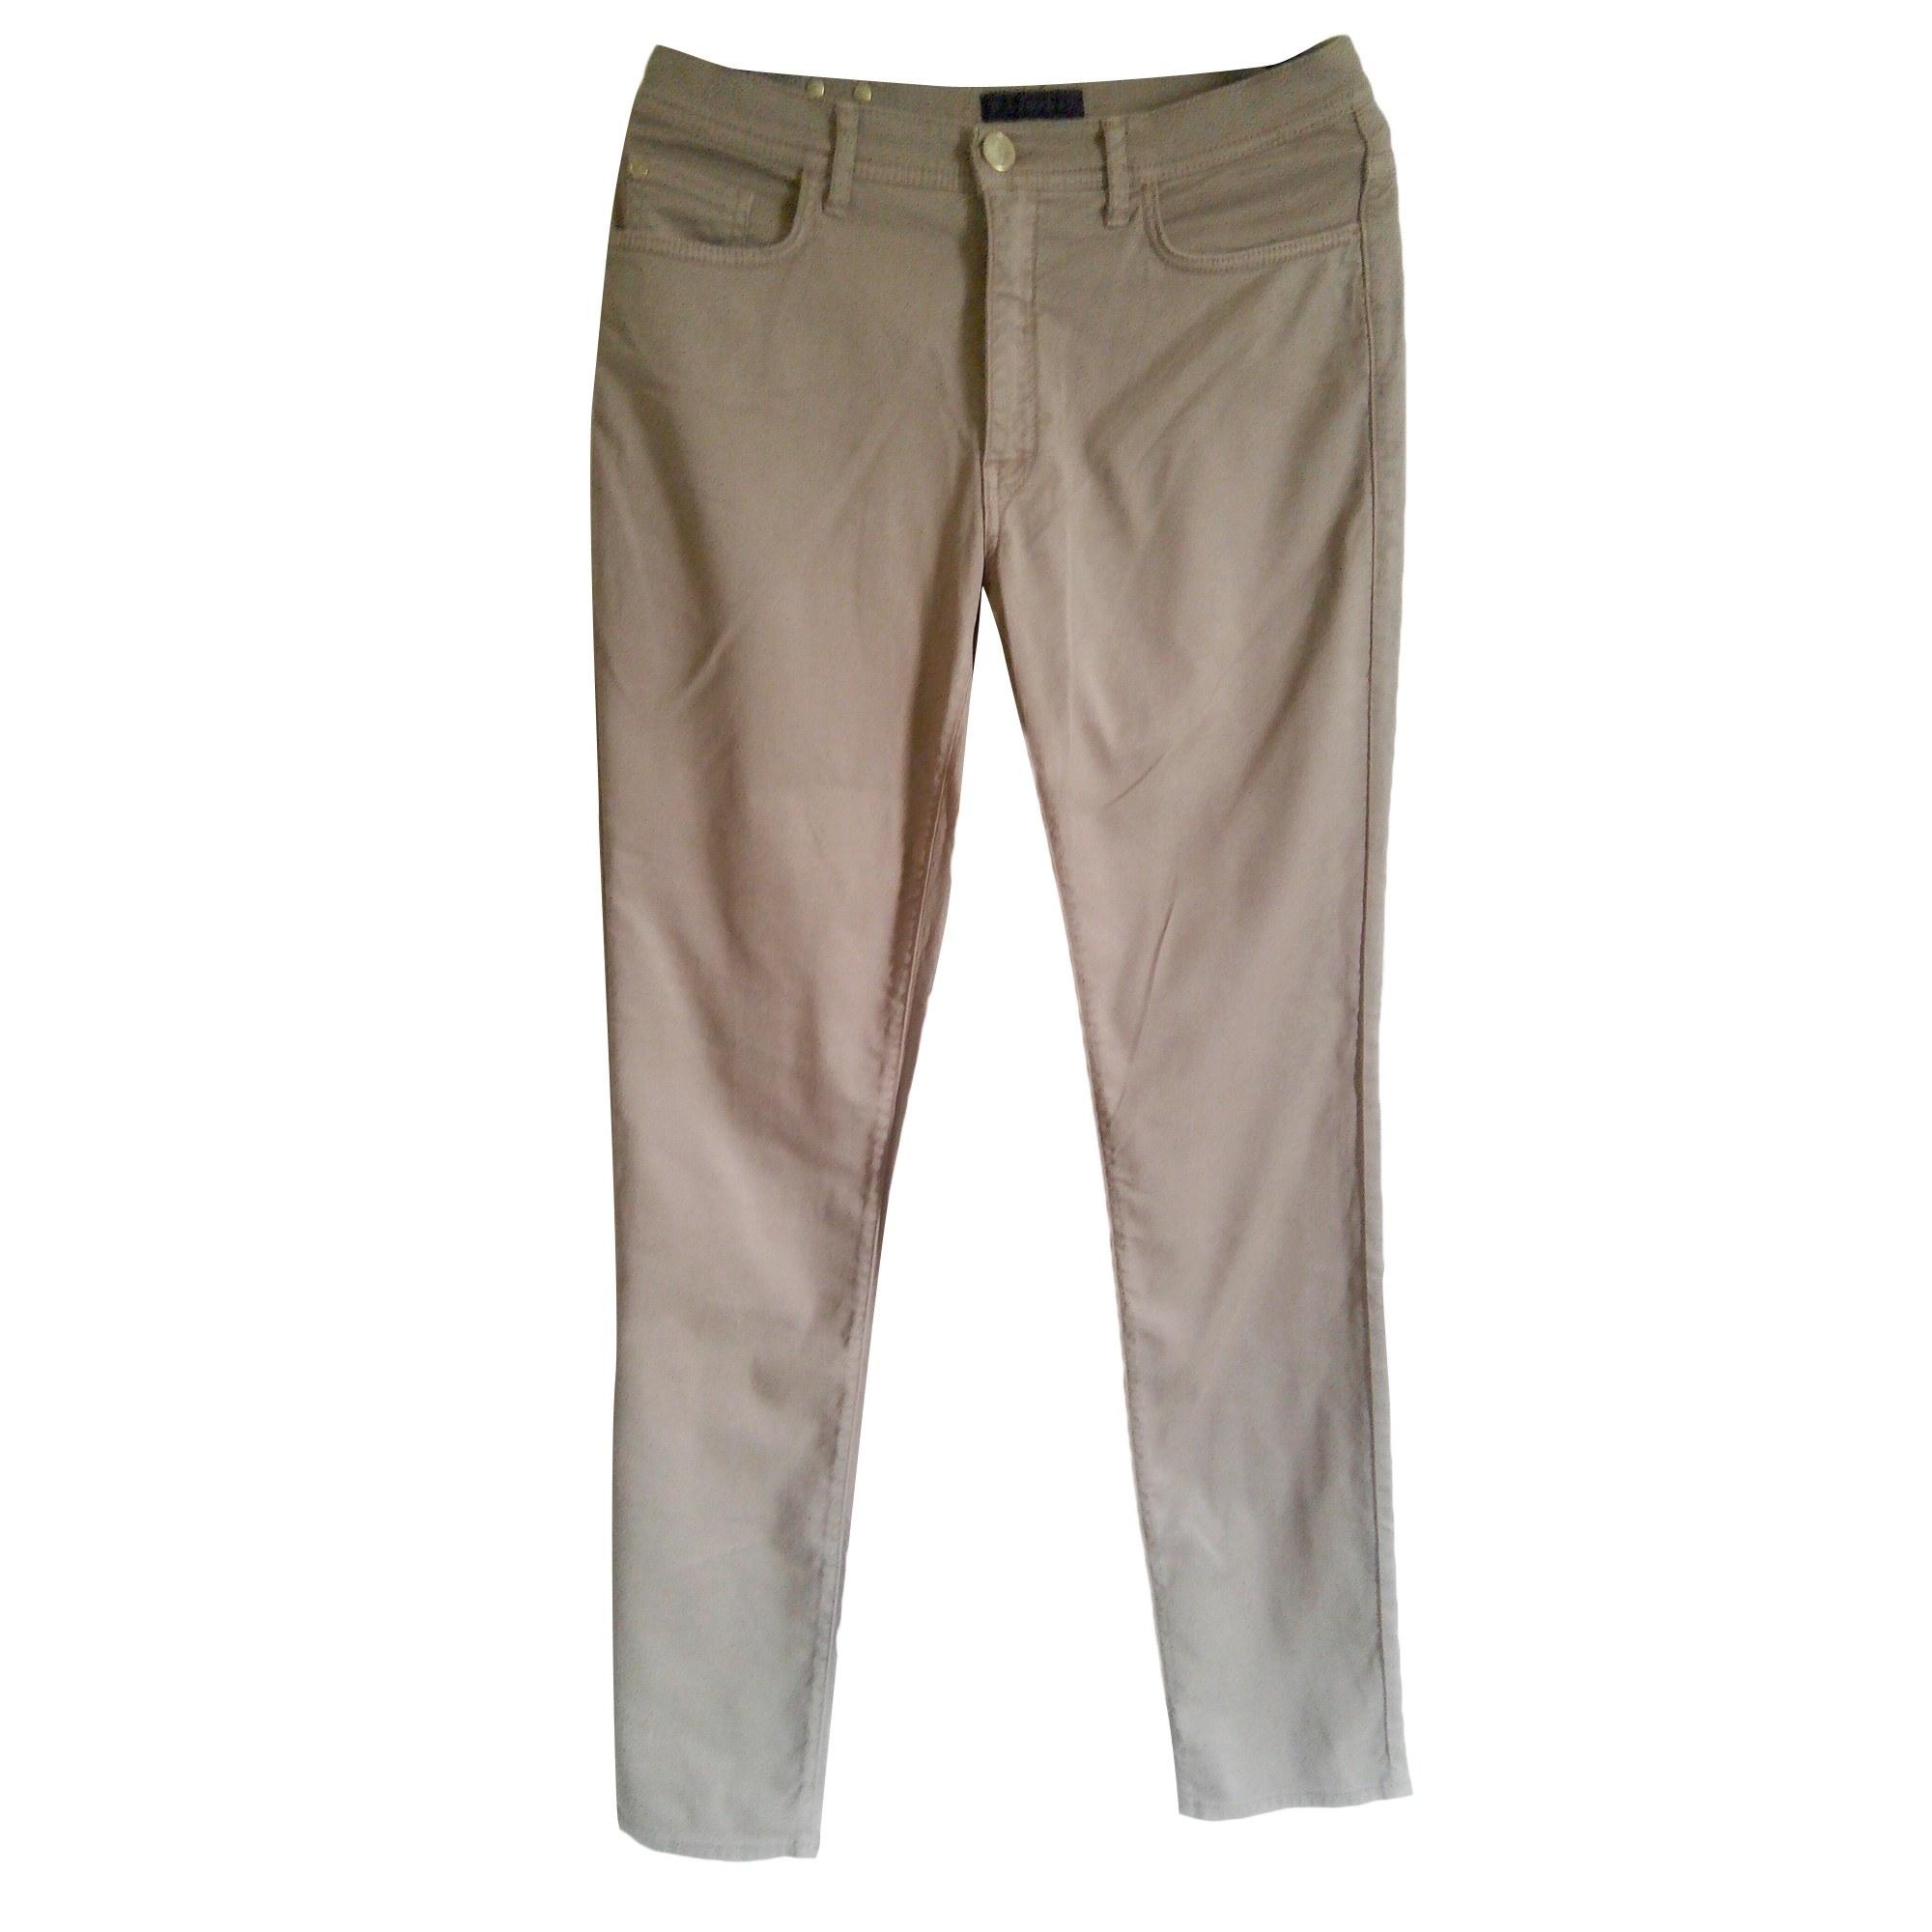 Pantalon droit TRU TRUSSARDI Beige, camel